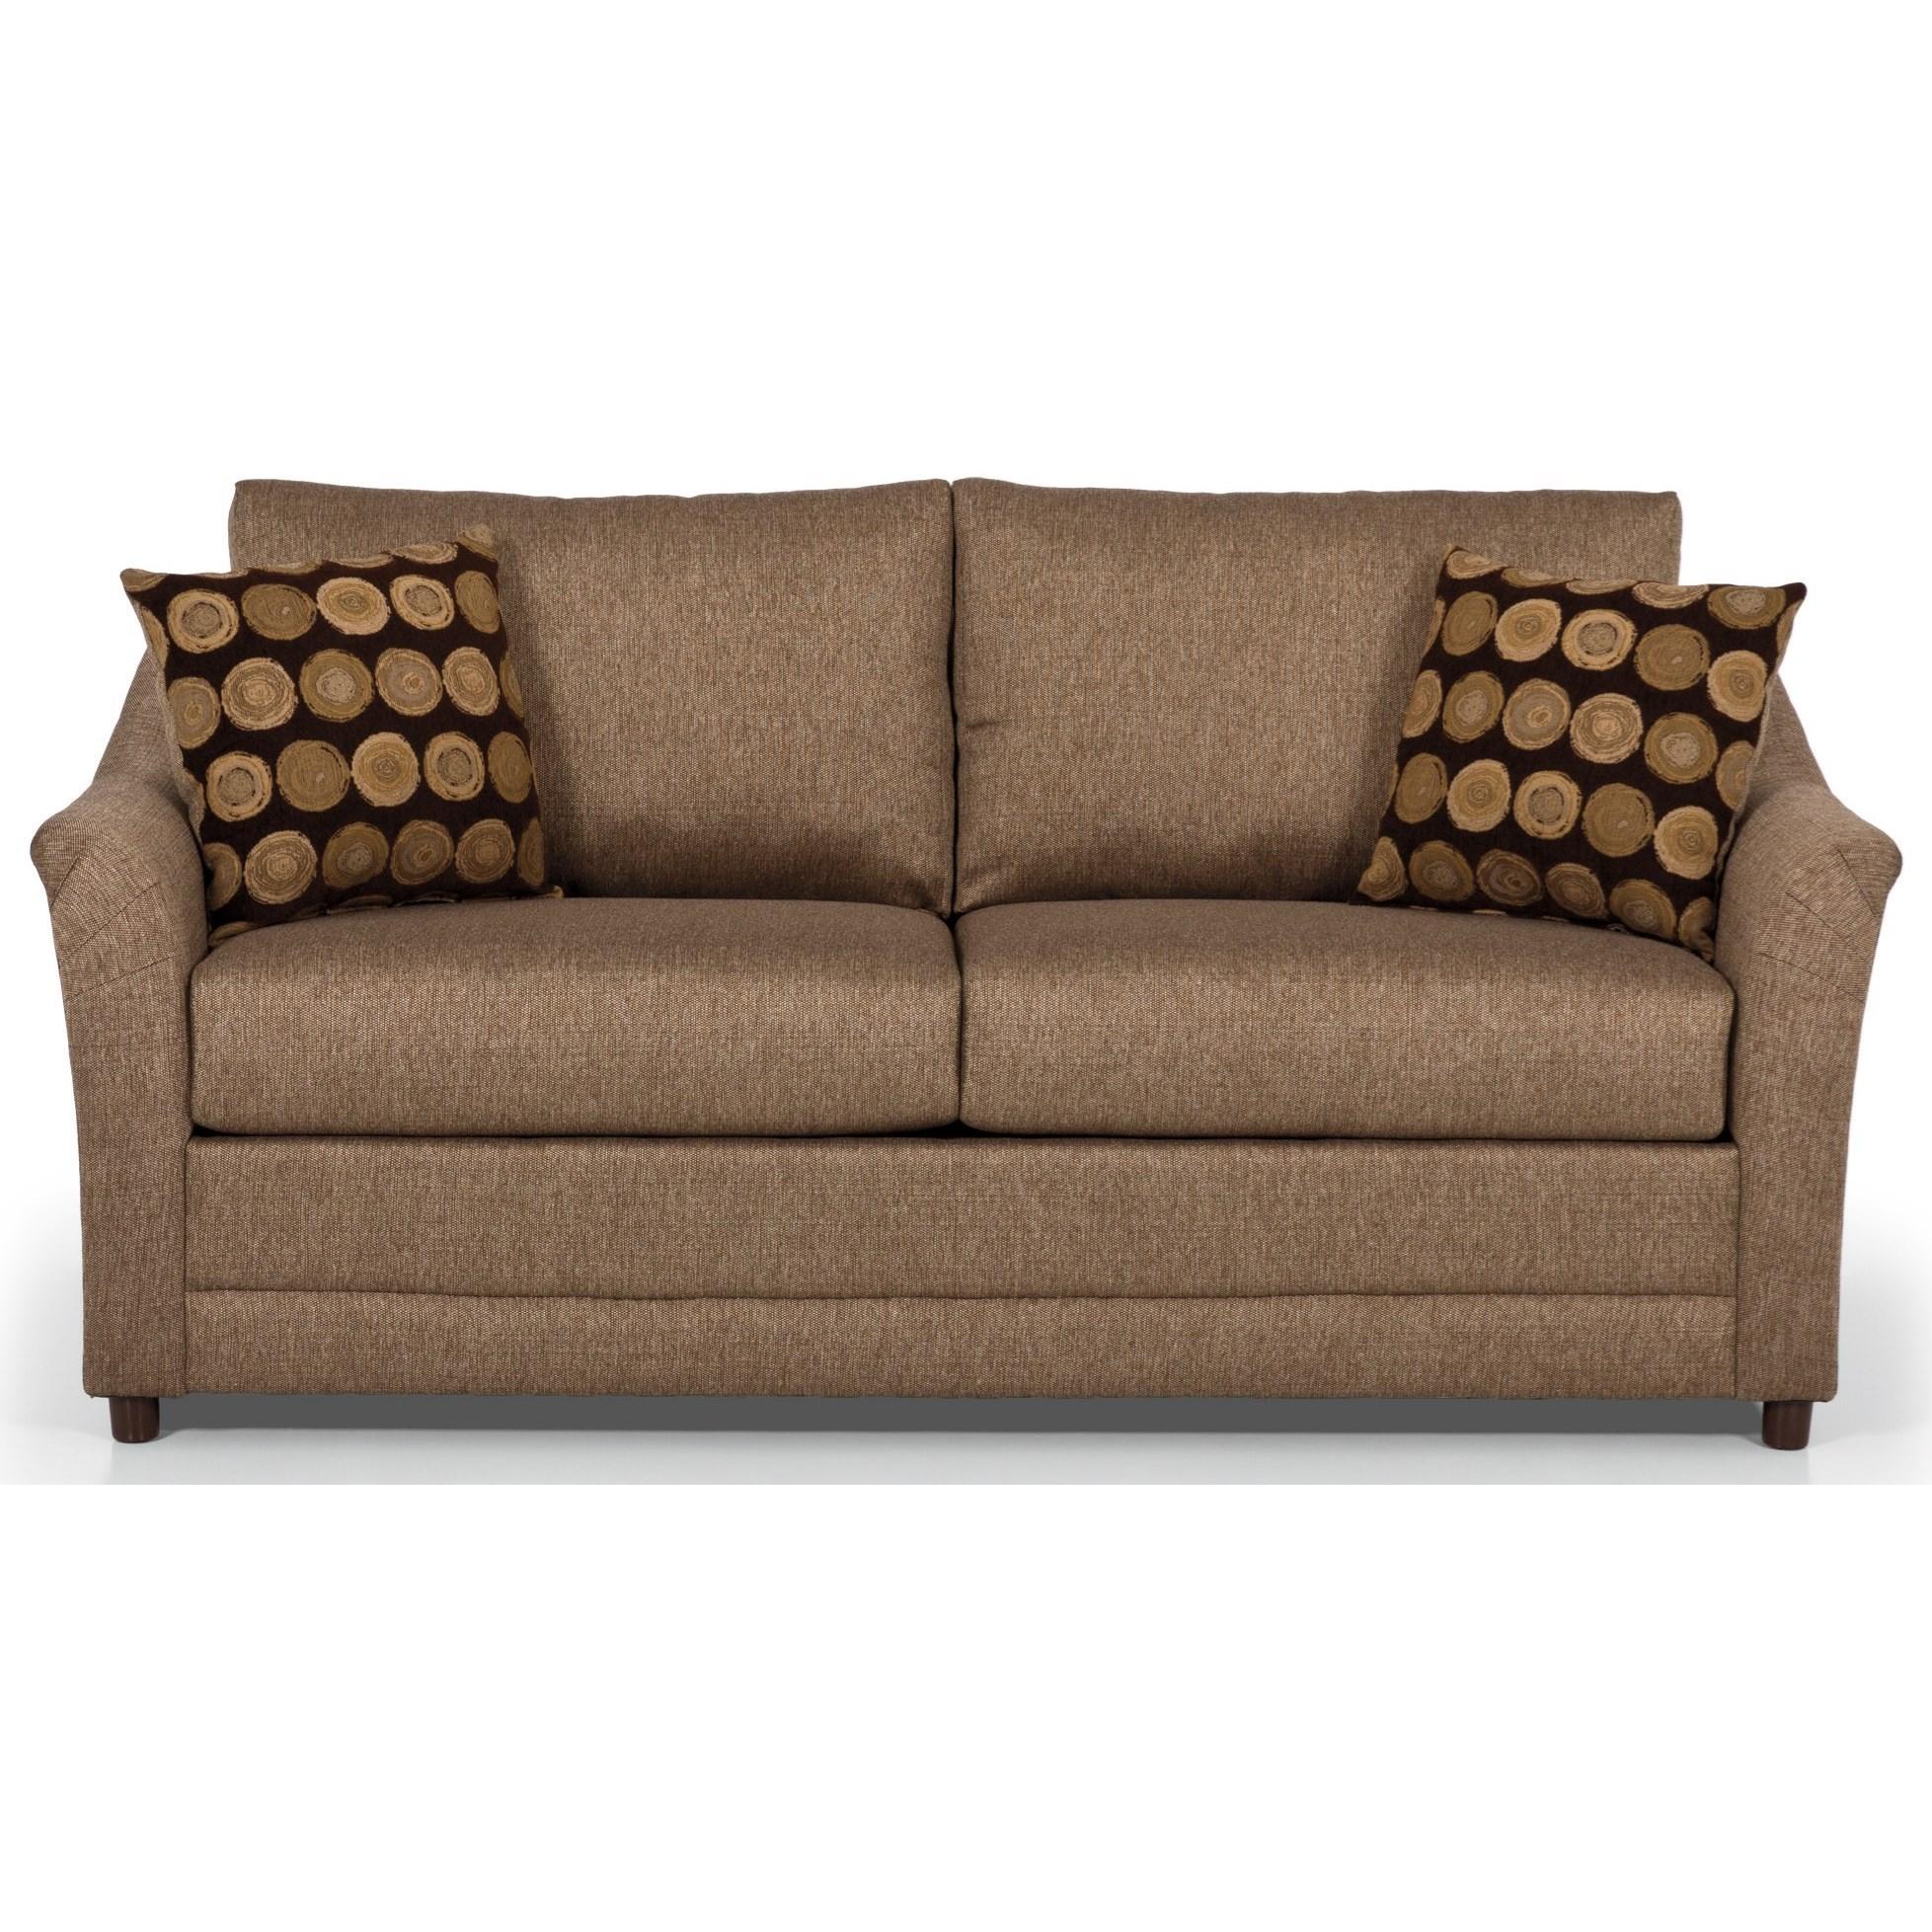 201 Full Sofa Sleeper by Stanton at Wilson's Furniture